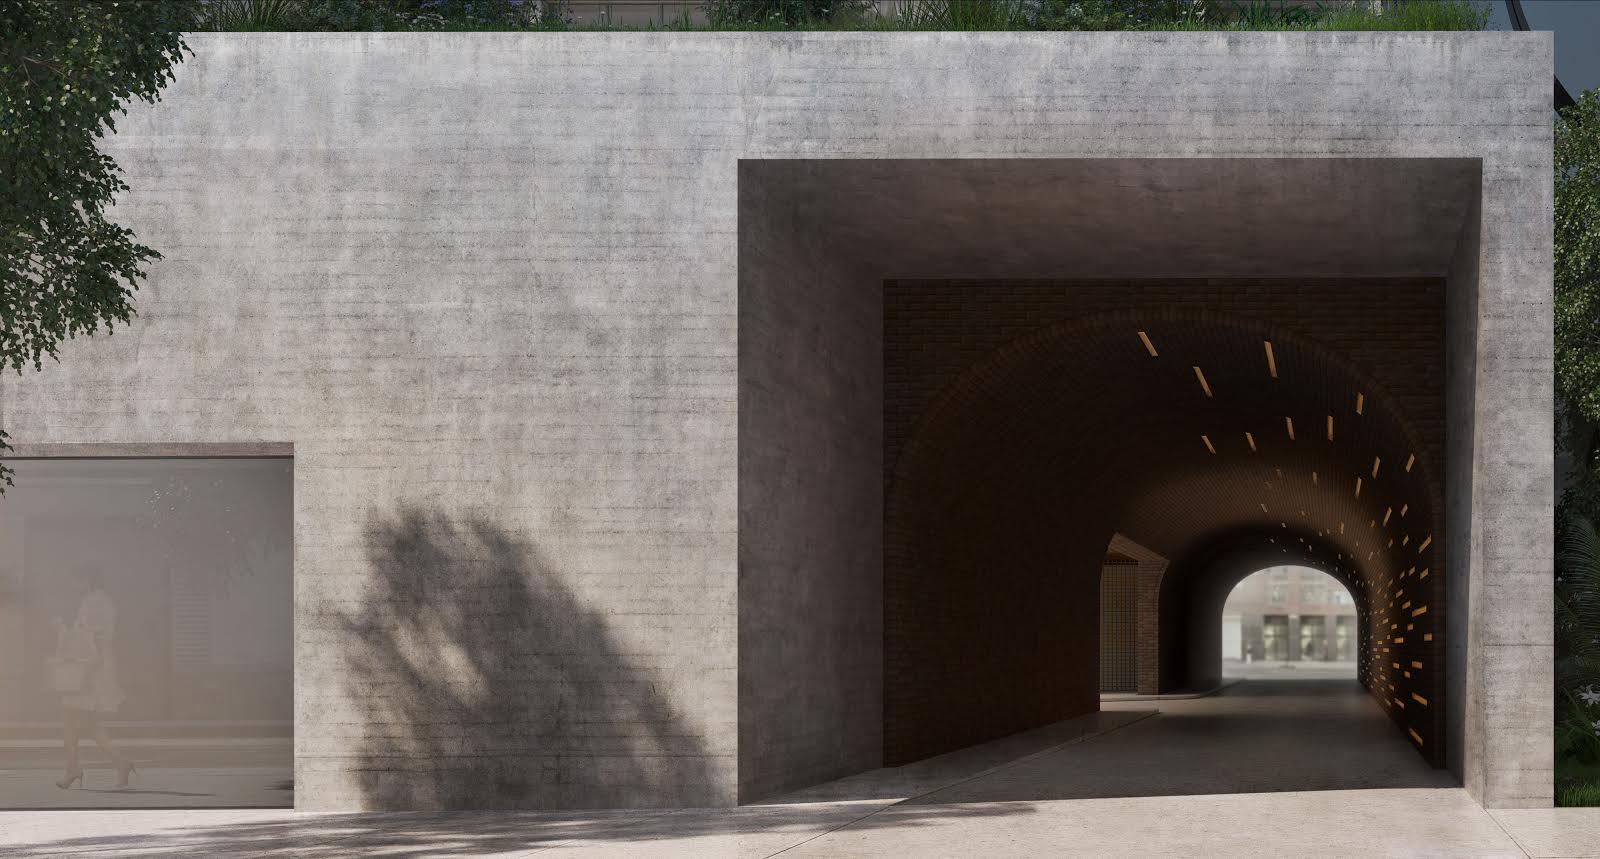 Jardim, Isay Weinfeld, West Chelsea, High Line condos, New York starchitecture, Brazillian architecture